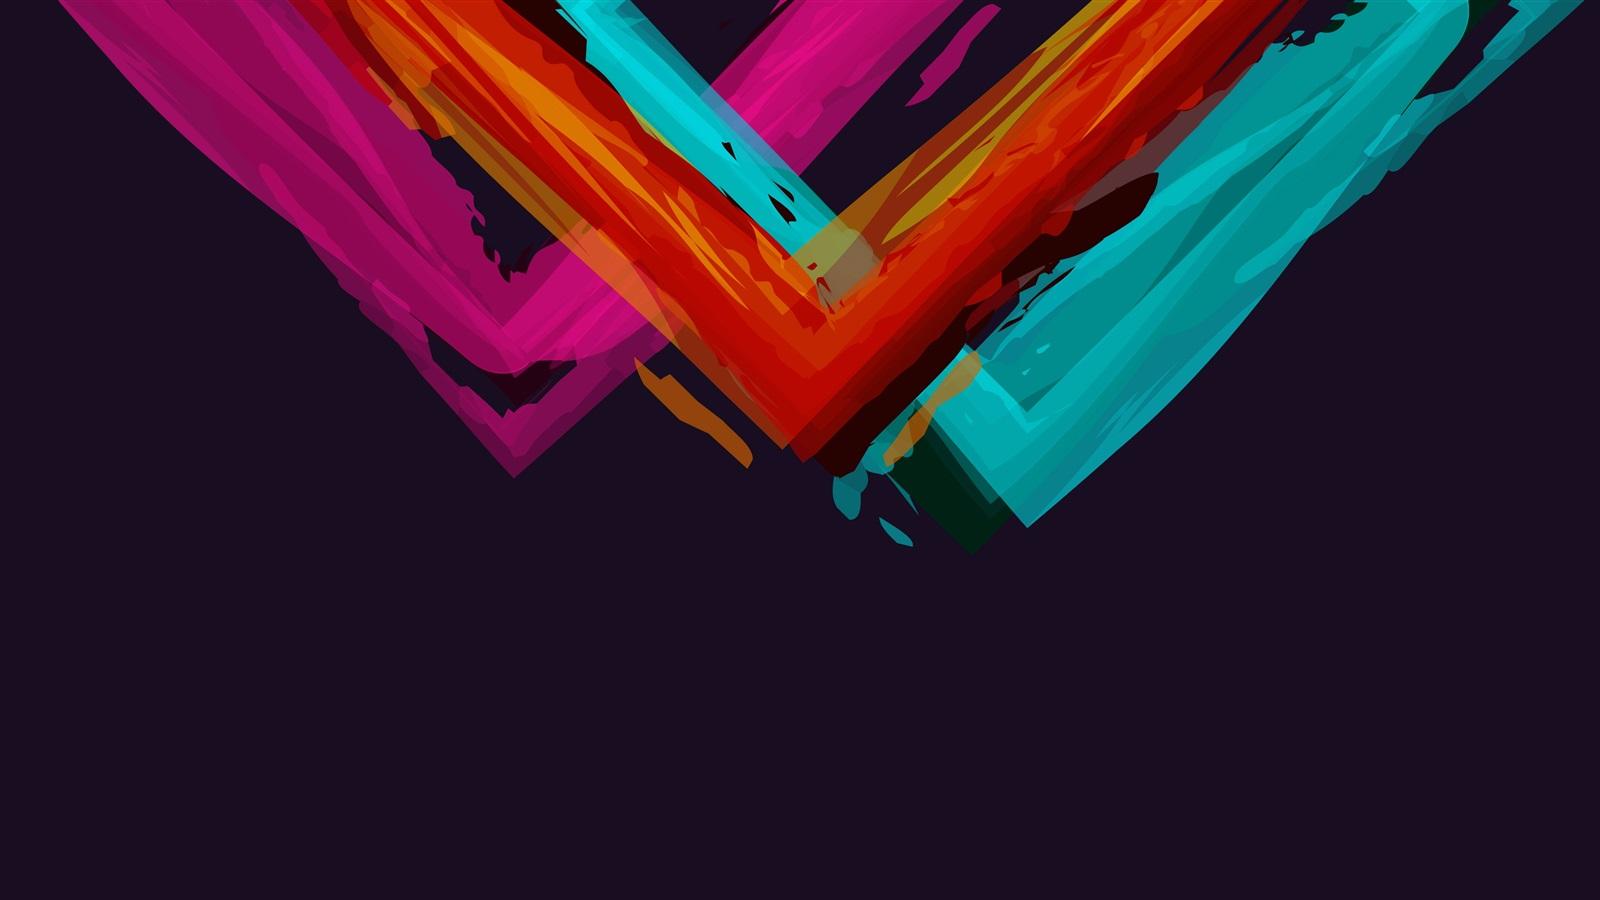 750x1334 Pubg Minimalism 4k Iphone 6 Iphone 6s Iphone 7: Fondos De Pantalla Ángulos De Pintura Colorida, Fondo